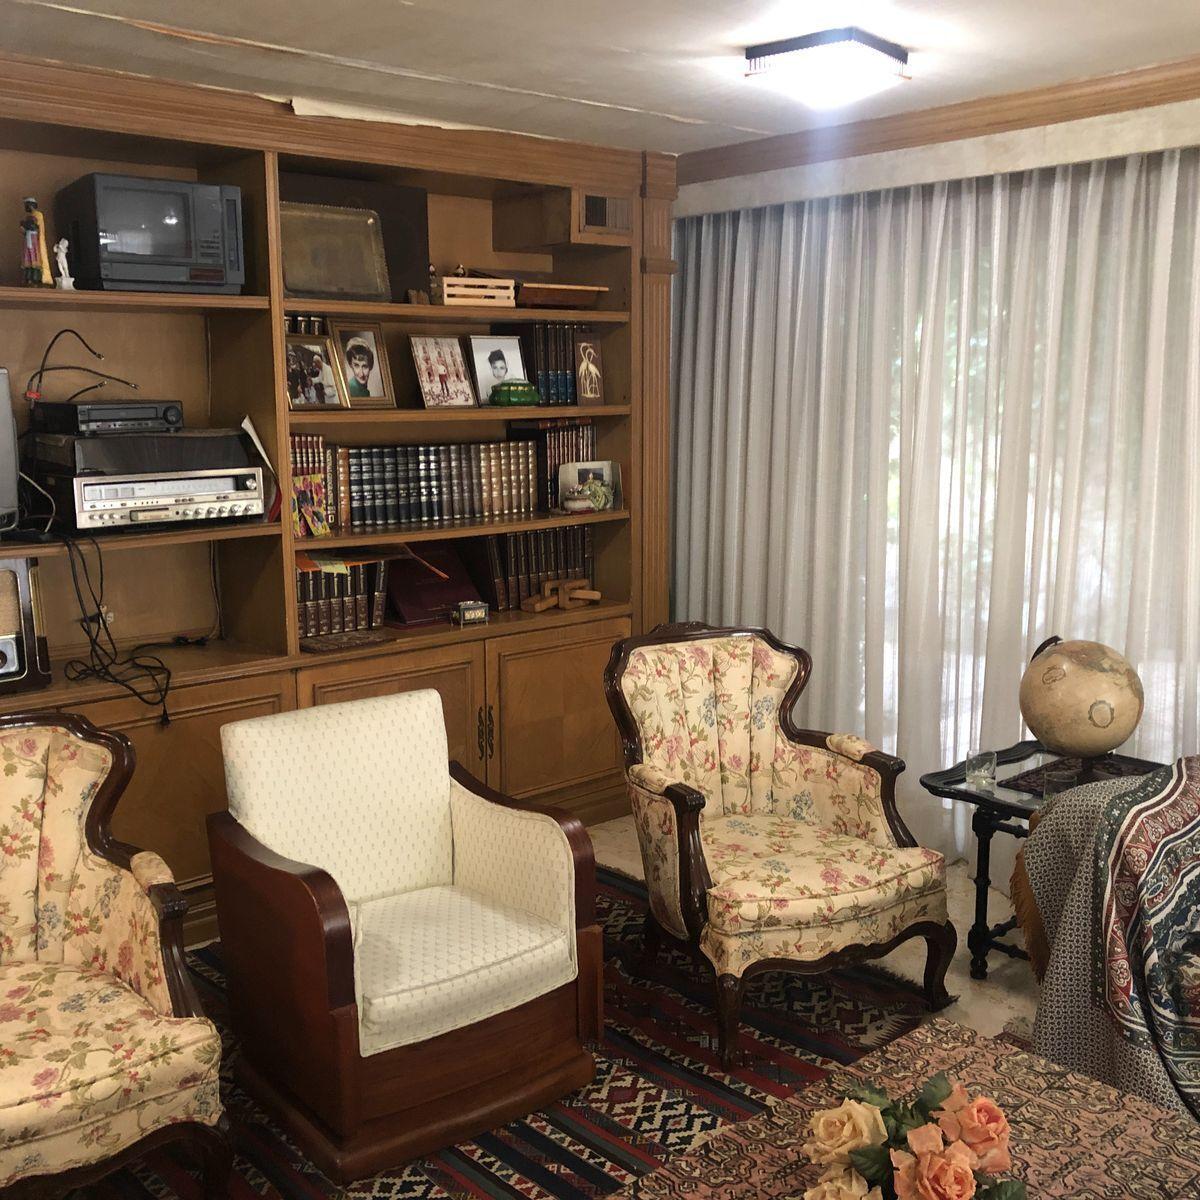 10 de 36: Biblioteca ó family room ó recámara de visitas. (B)